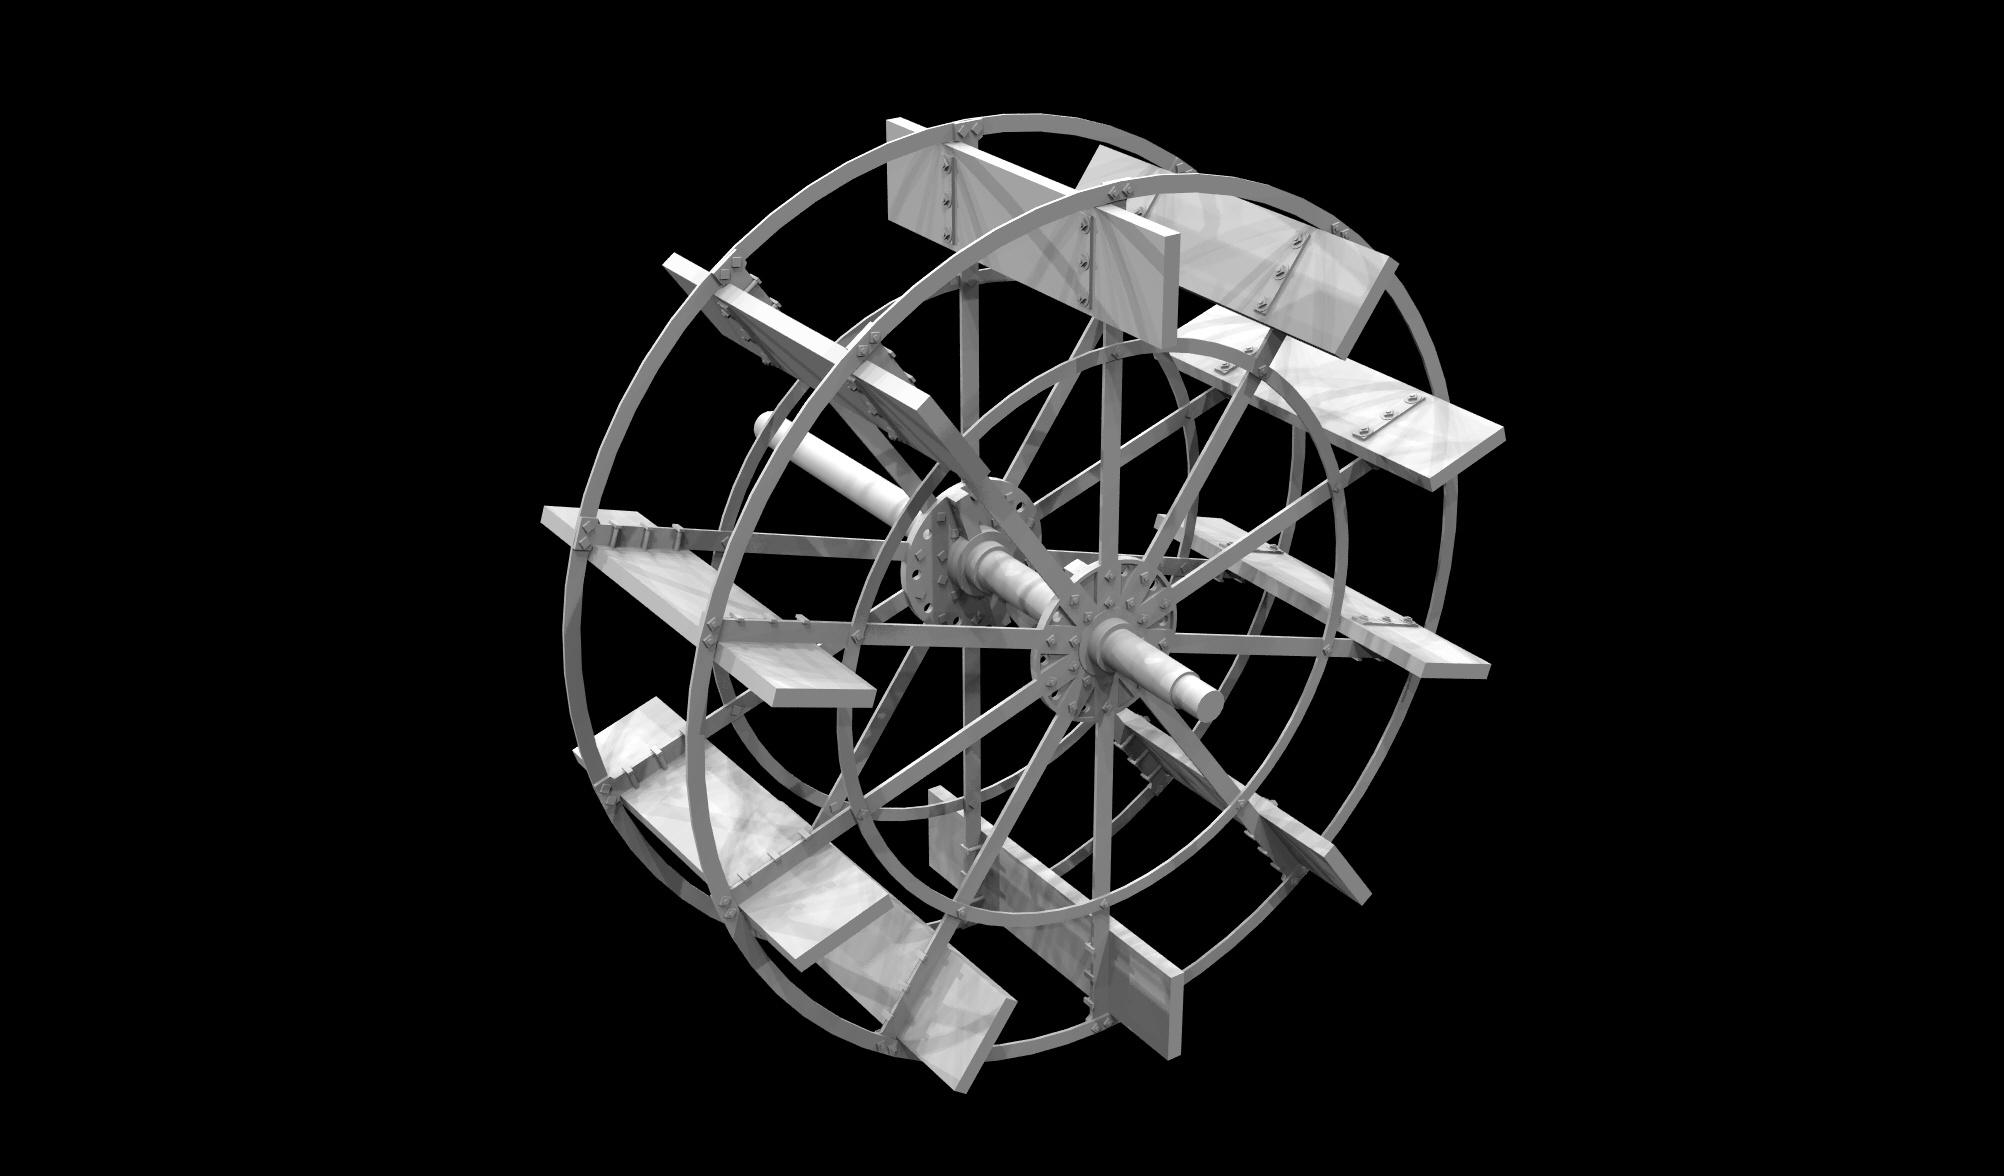 S.S. Beaver - Paddle Wheel